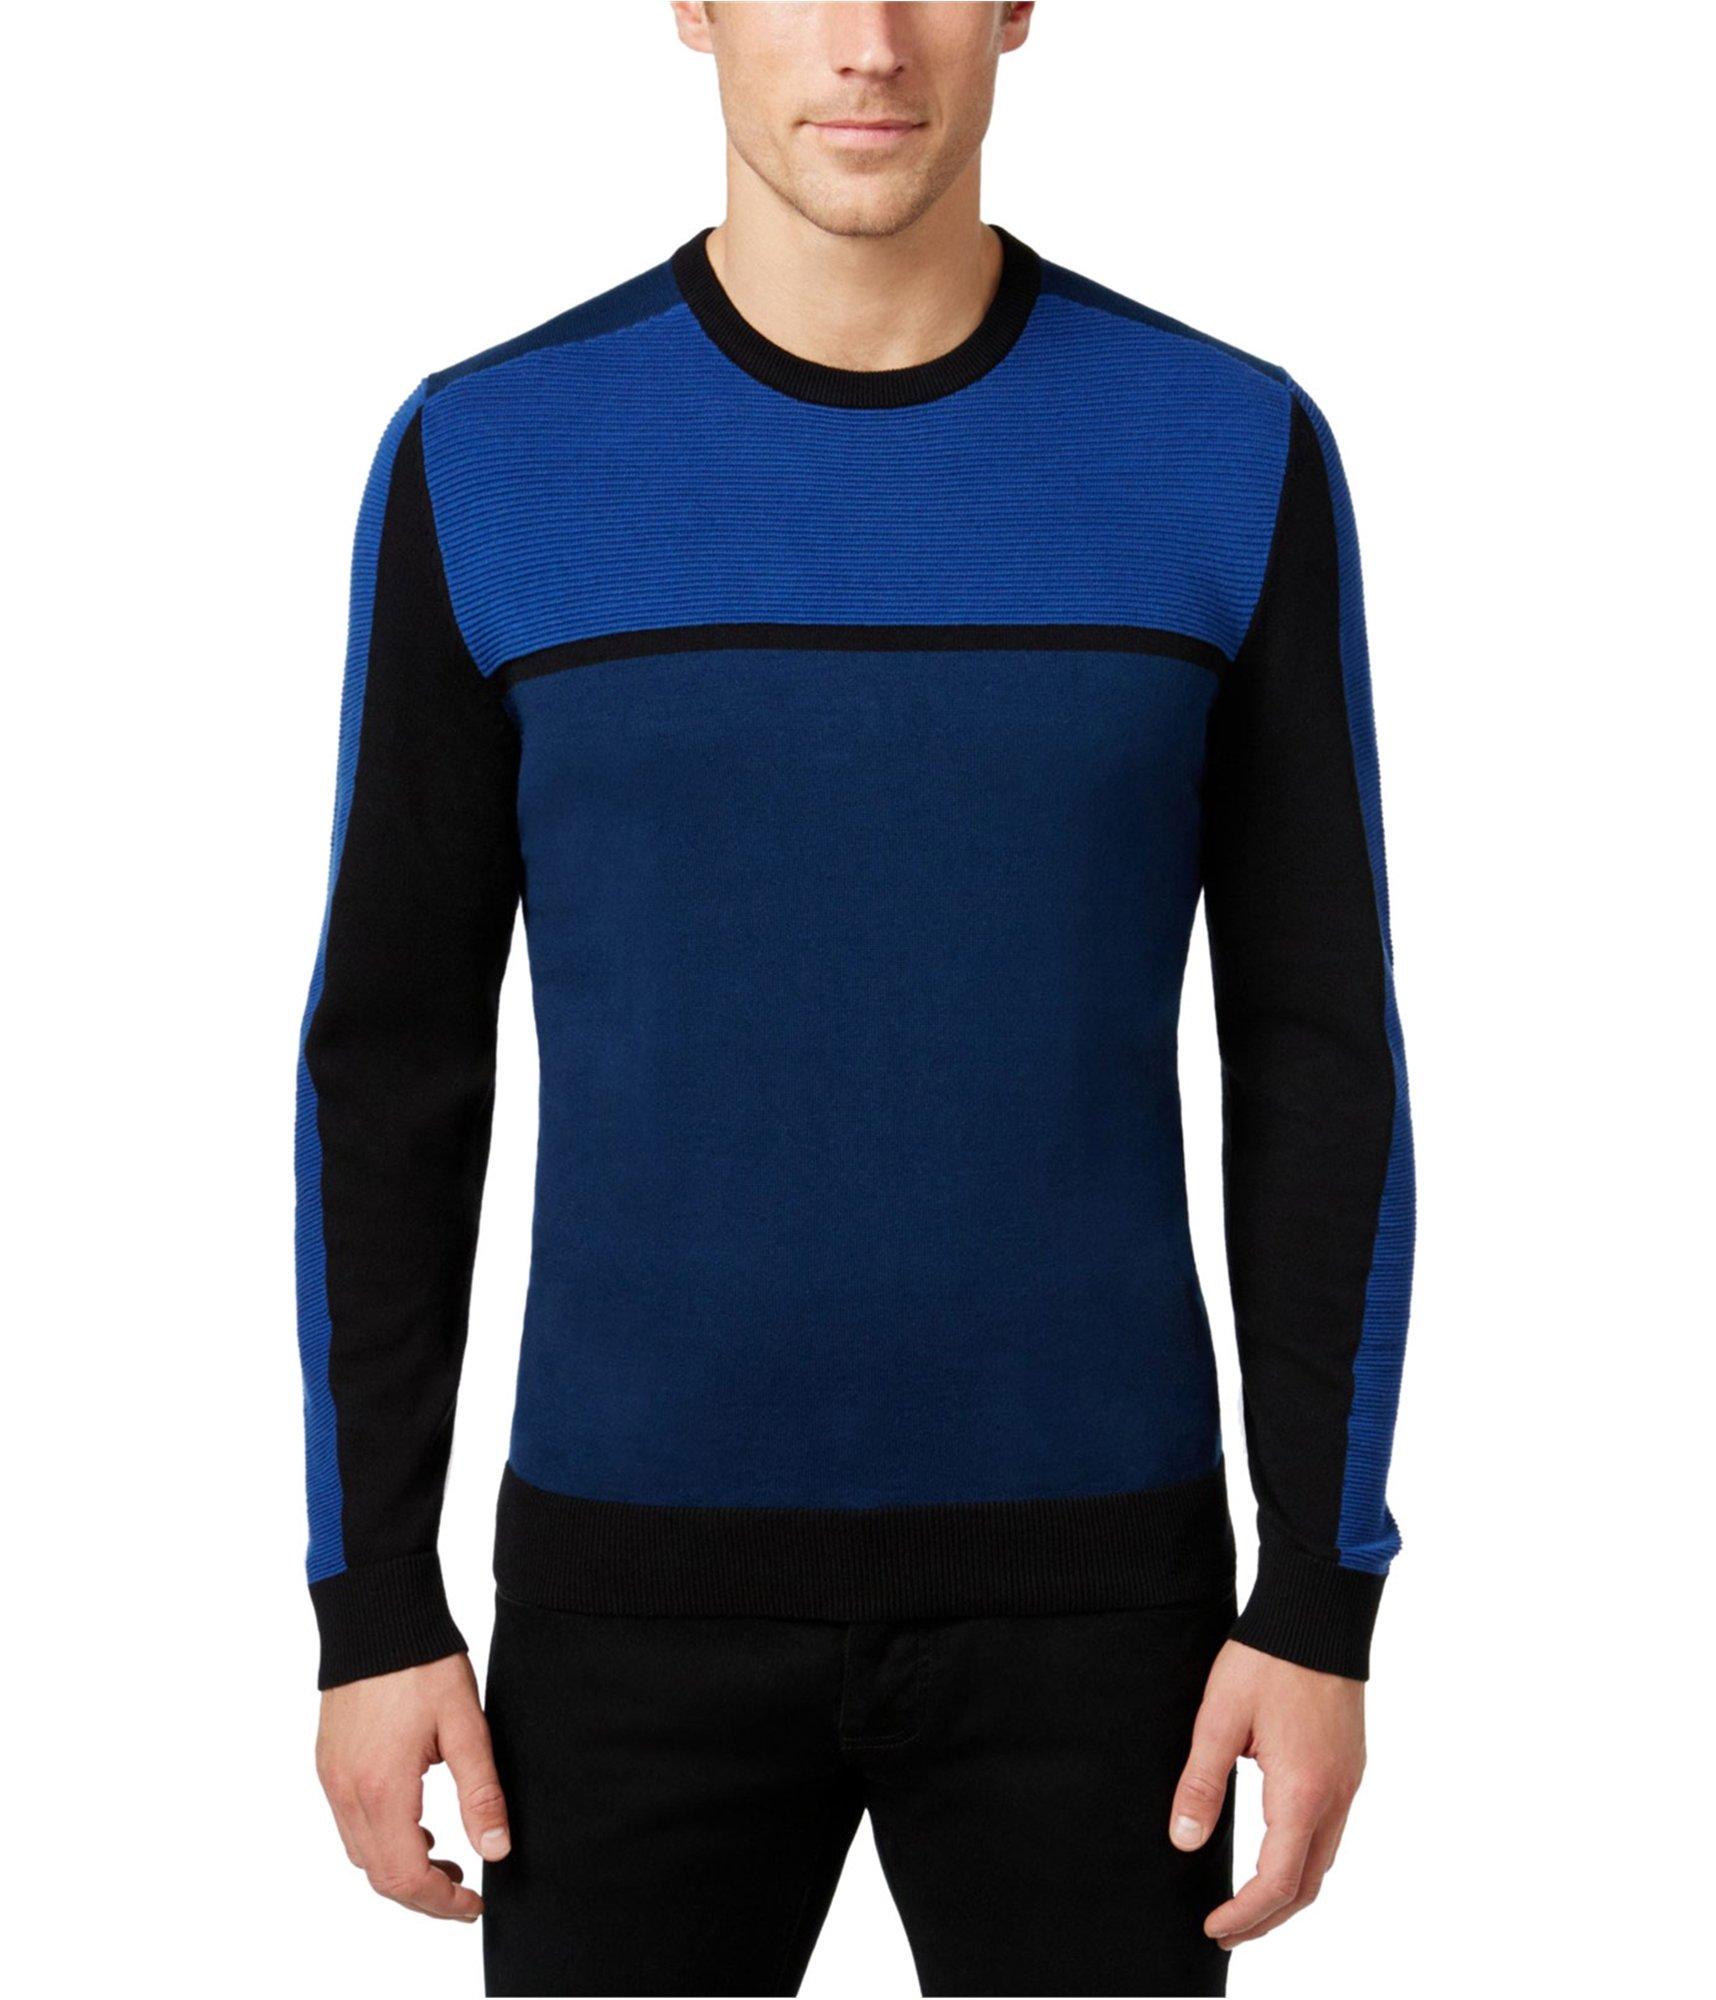 Alfani Navy Mens Medium Crewneck Ribbed Knit Sweater Blue M